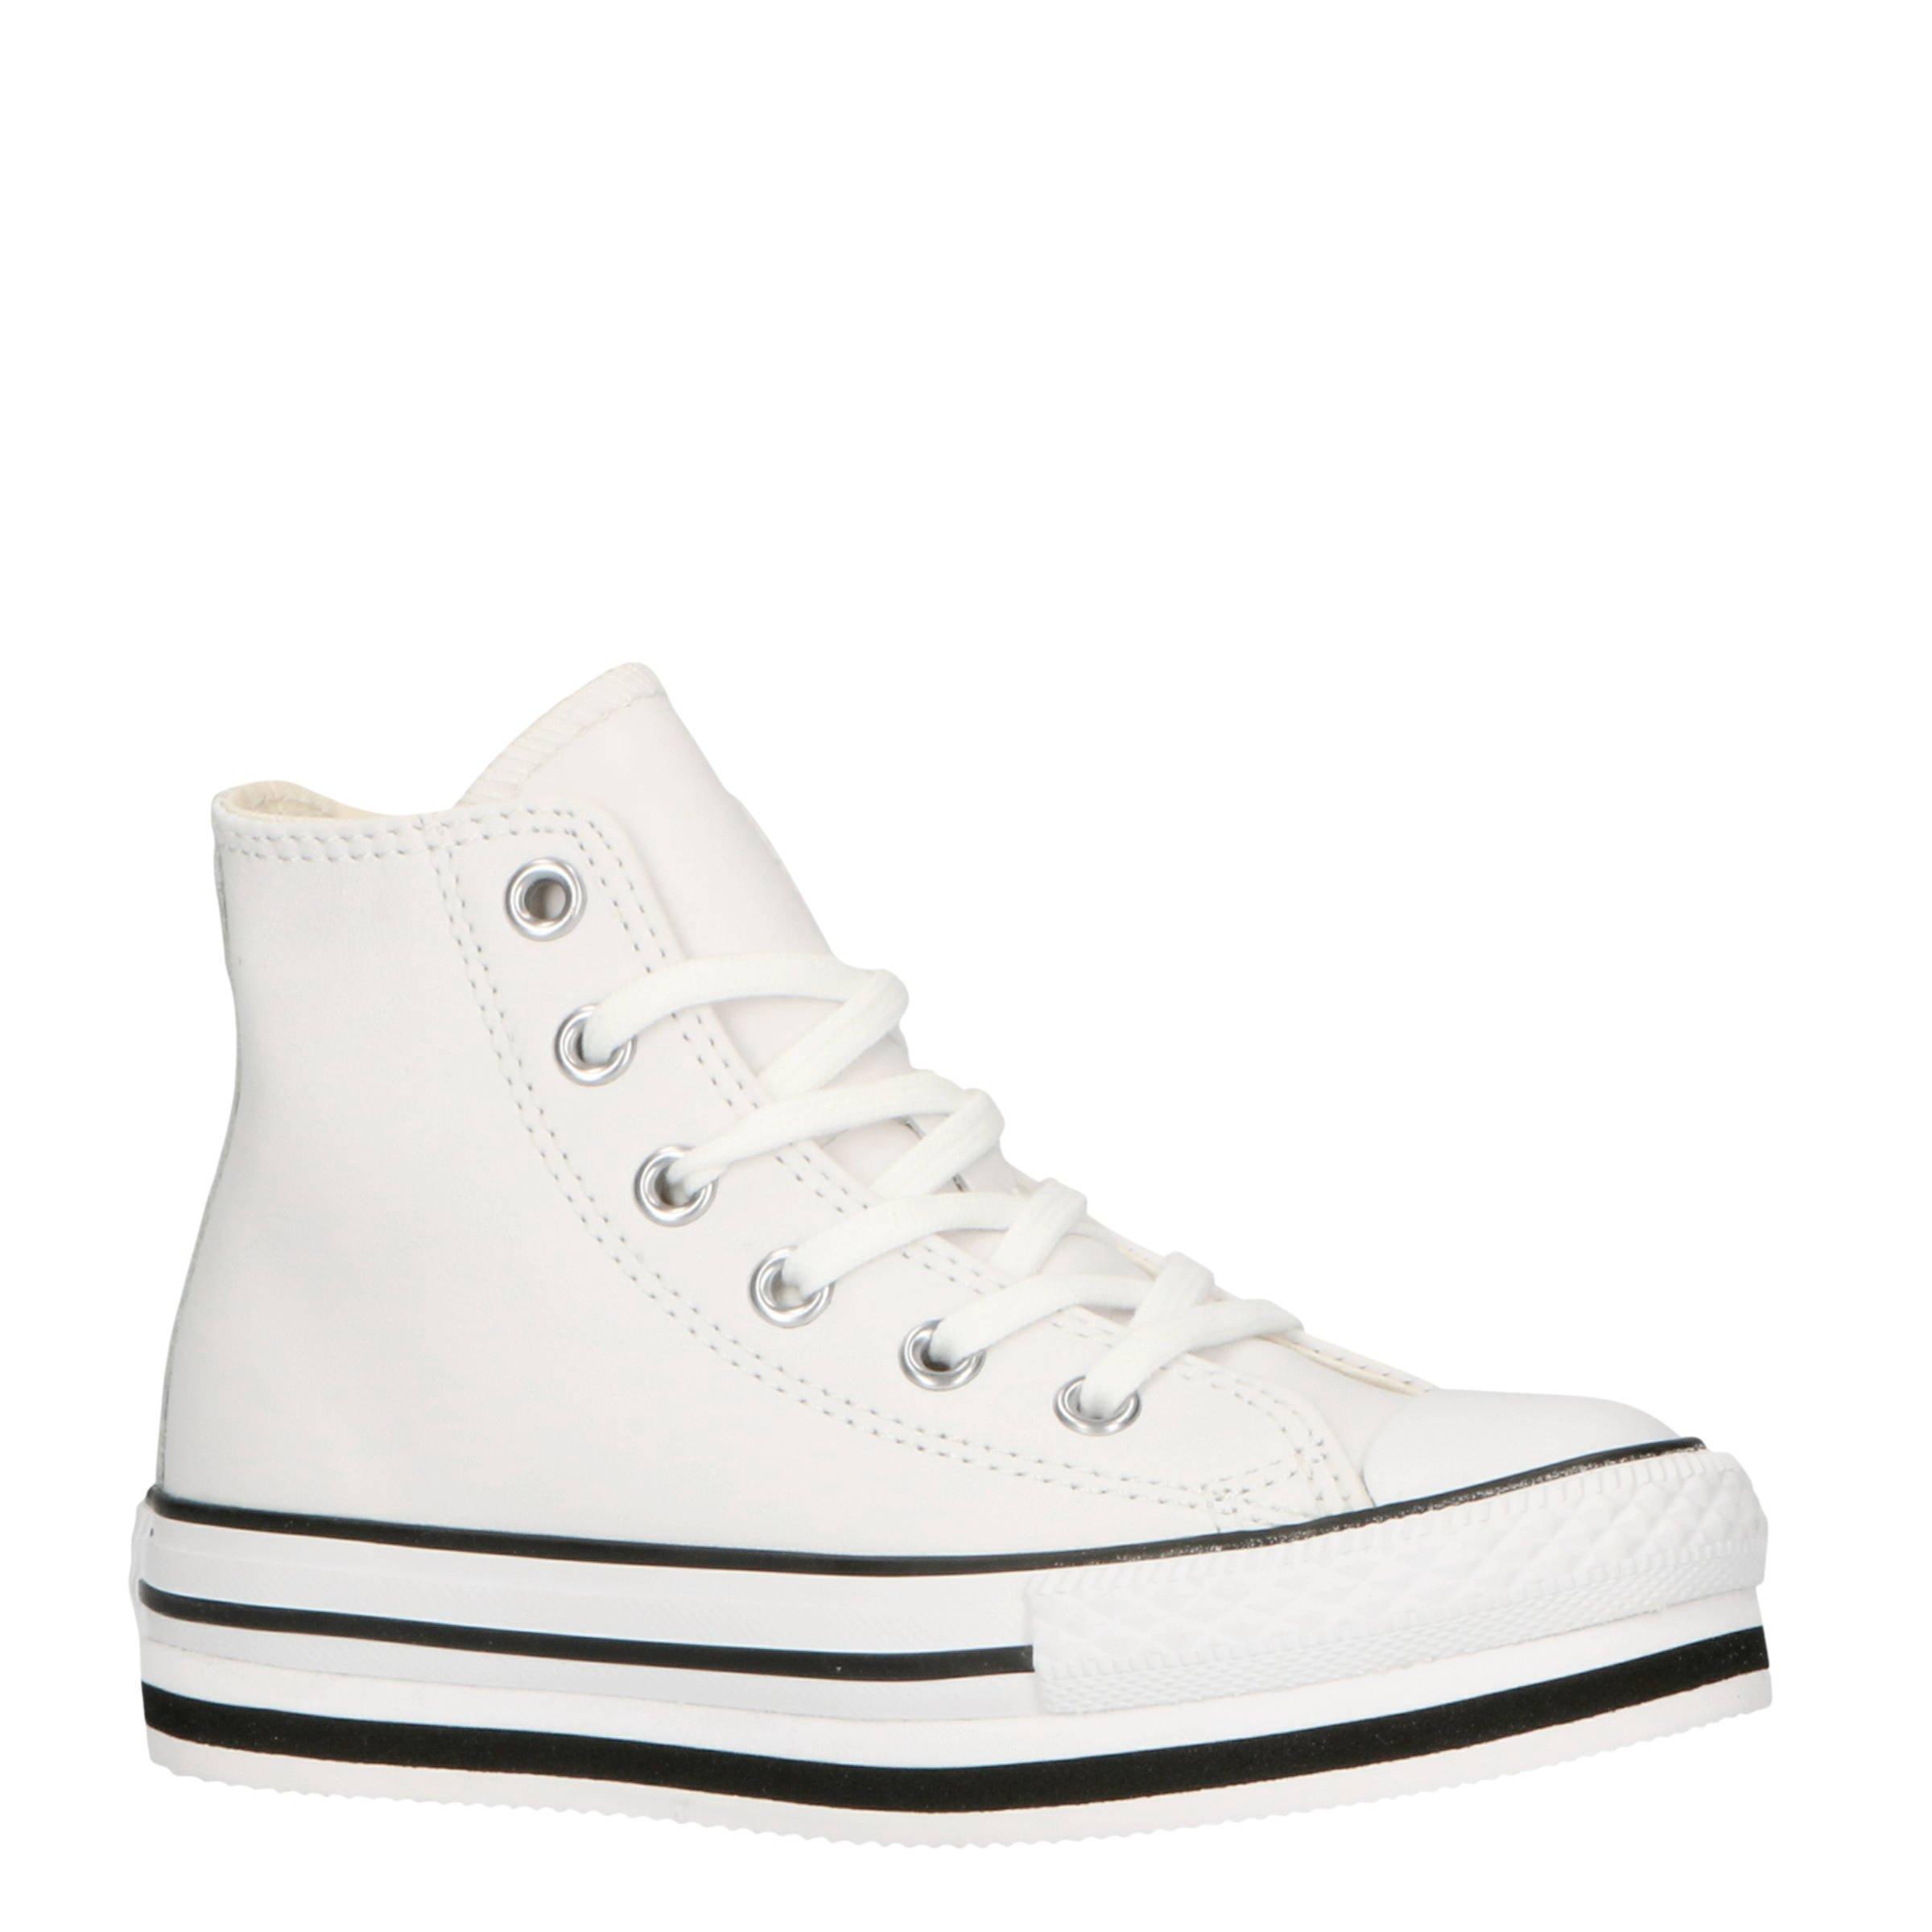 Sportschoenen Dames: schoenen Converse Platform Chelsee Hi